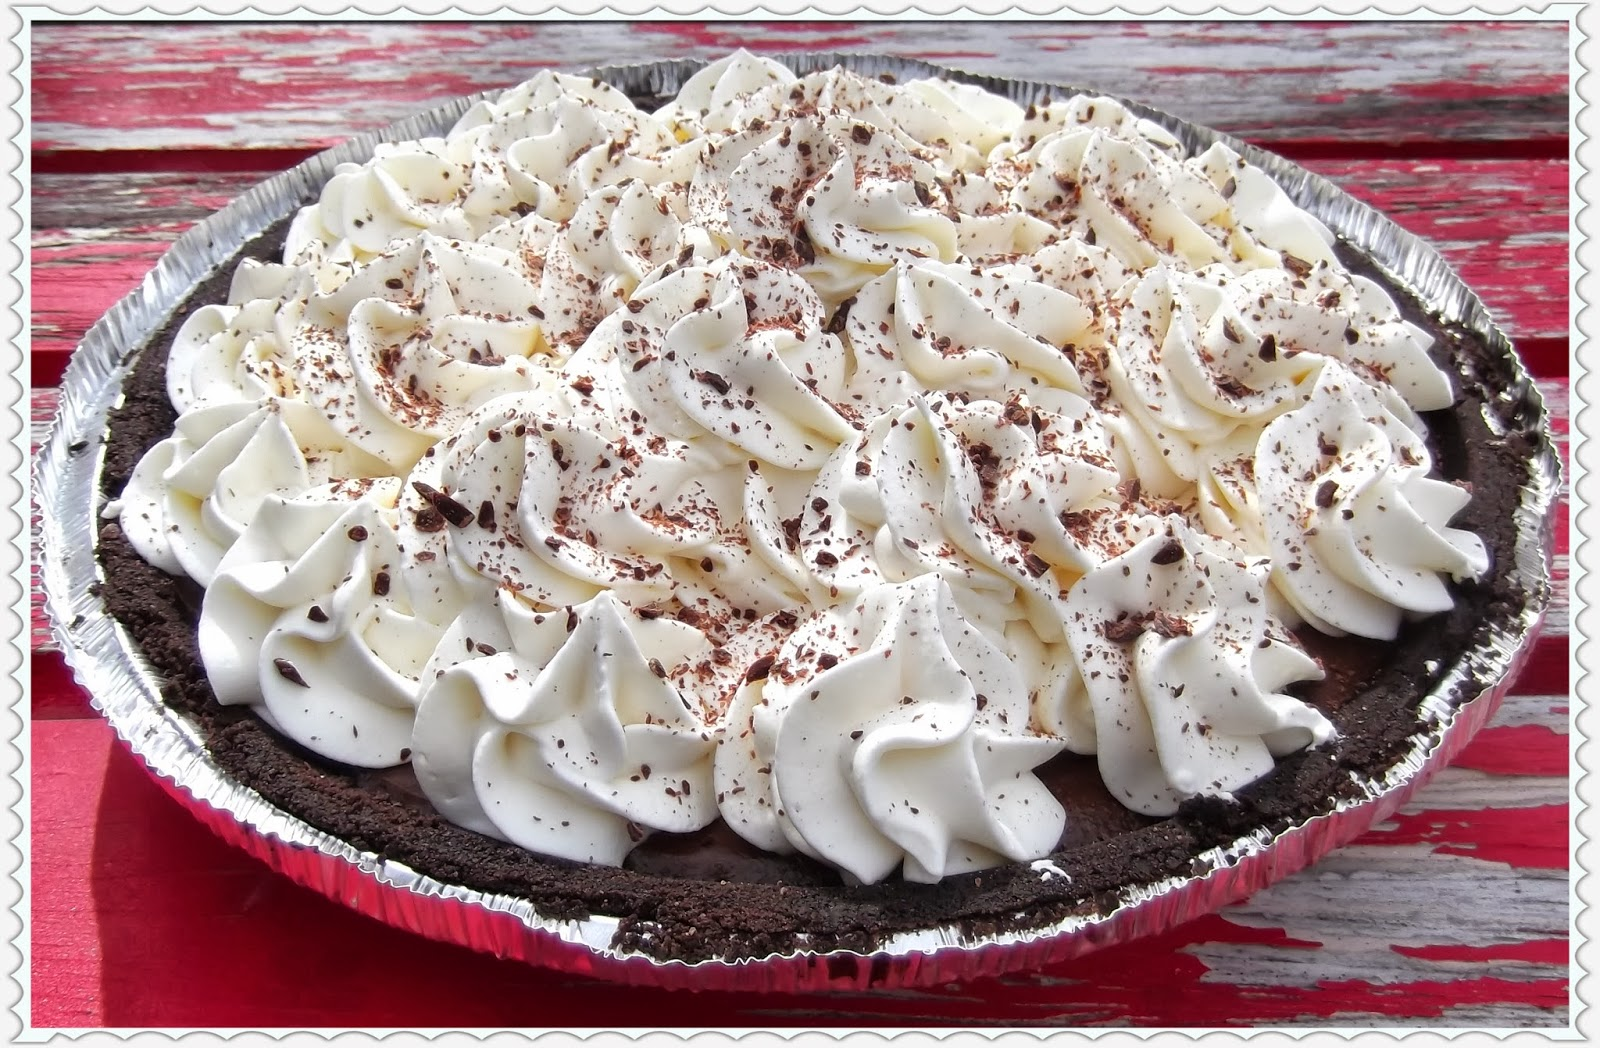 ... Chocolate Cream Pie with Oreo Crust, Whipped Cream and Chocolate